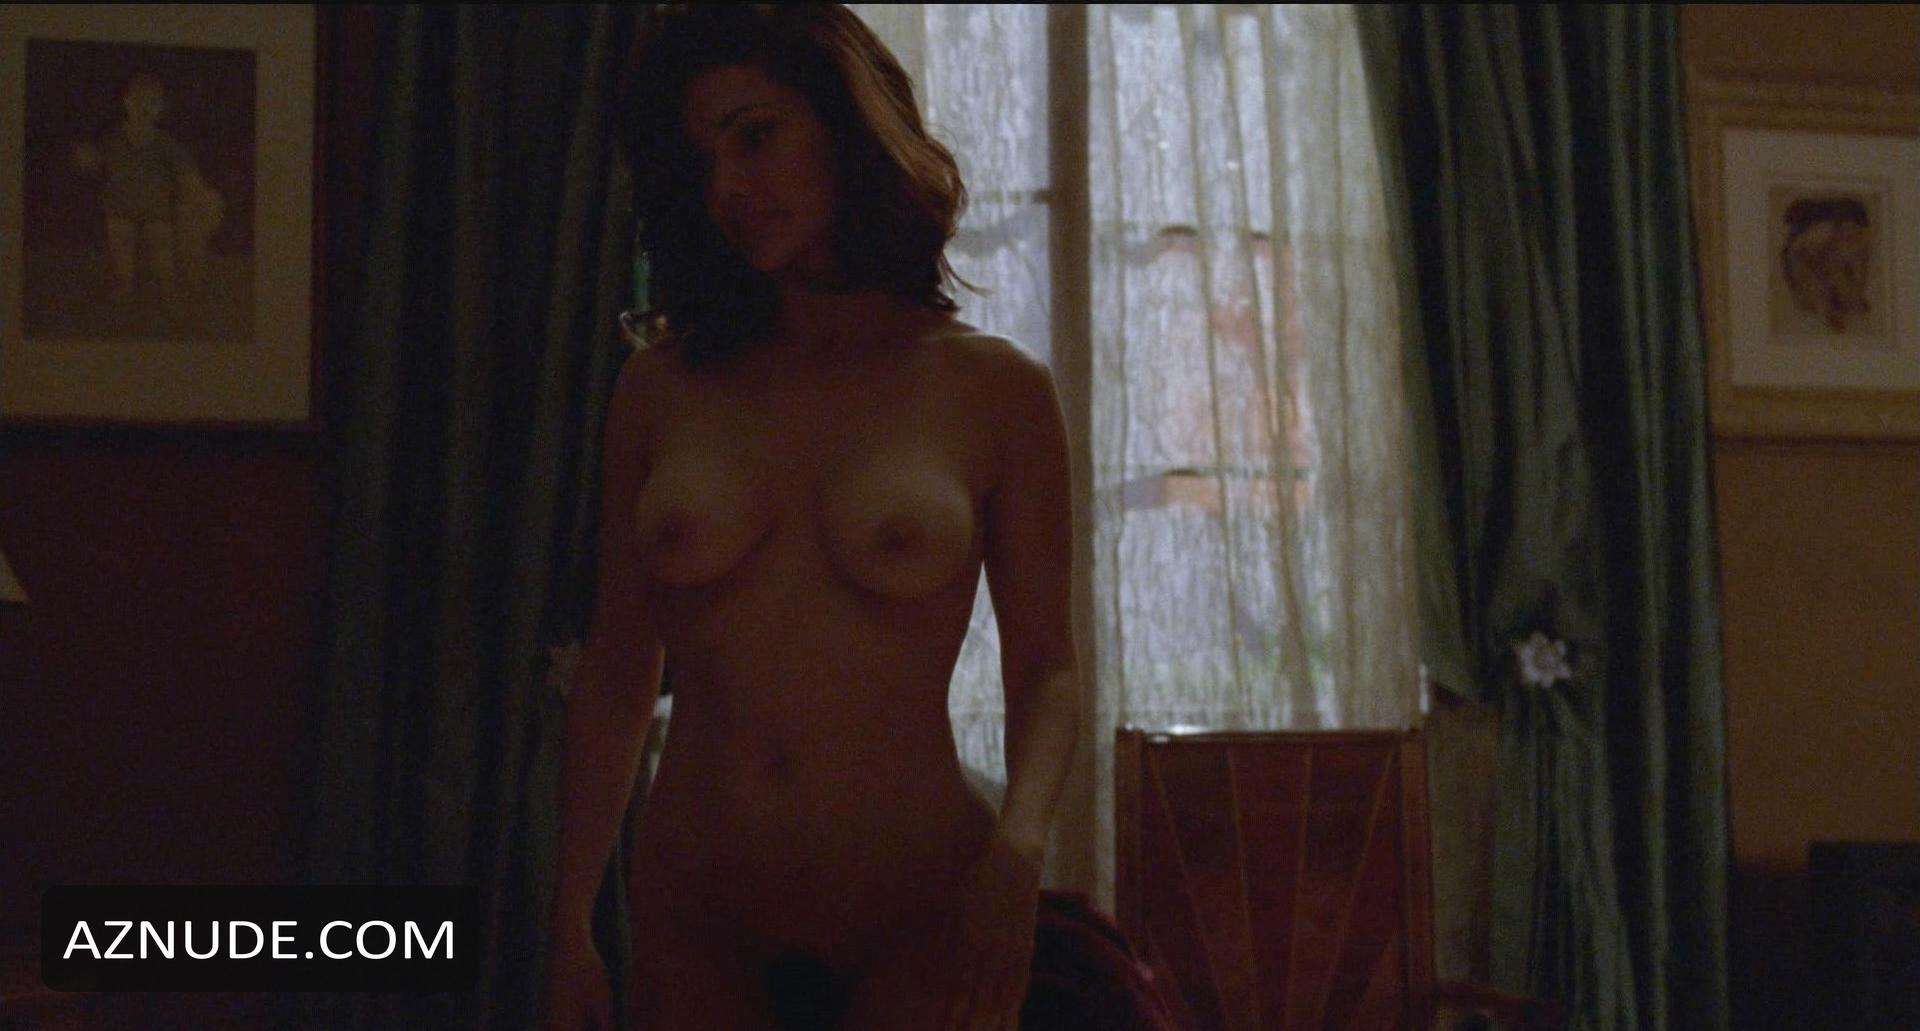 Jessica simpson daisy duke nude then